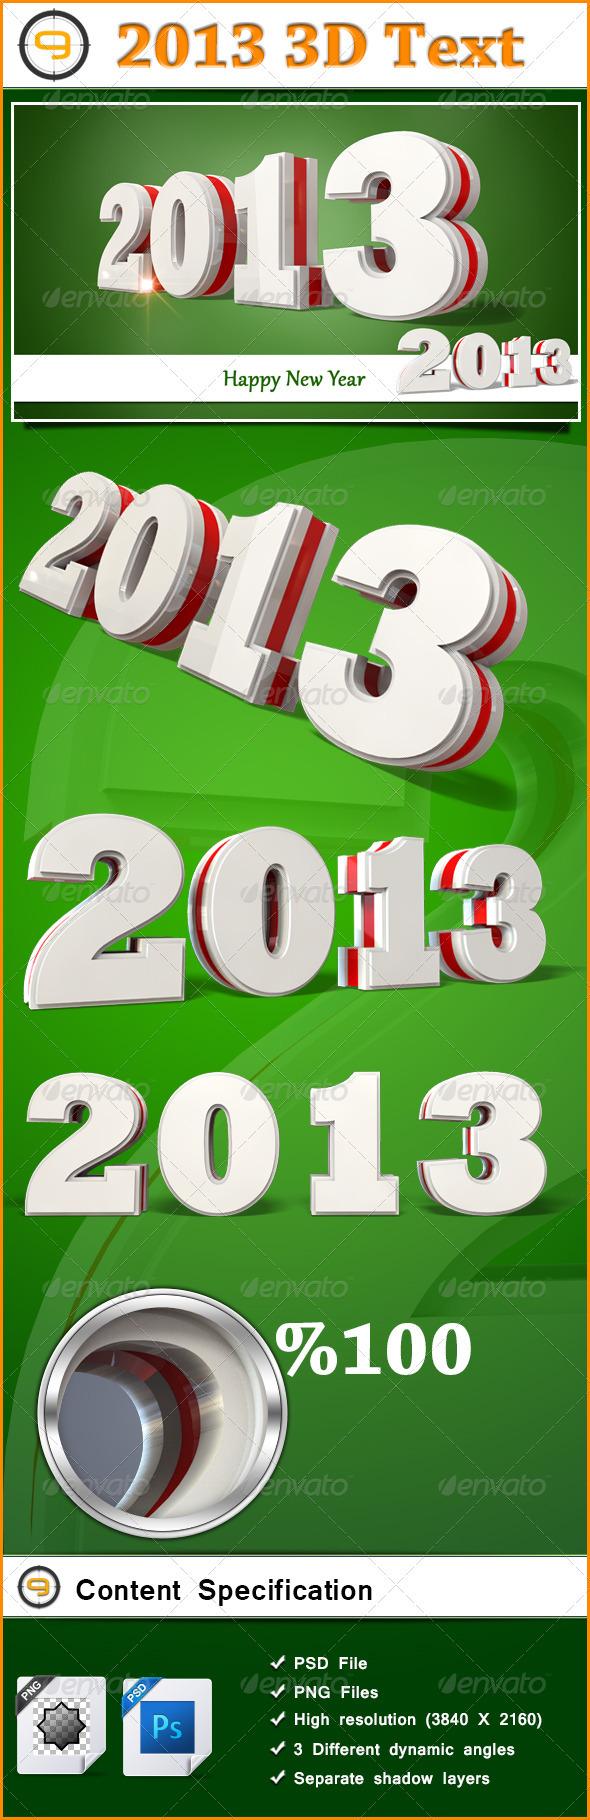 GraphicRiver 2013 3D Text 3725567